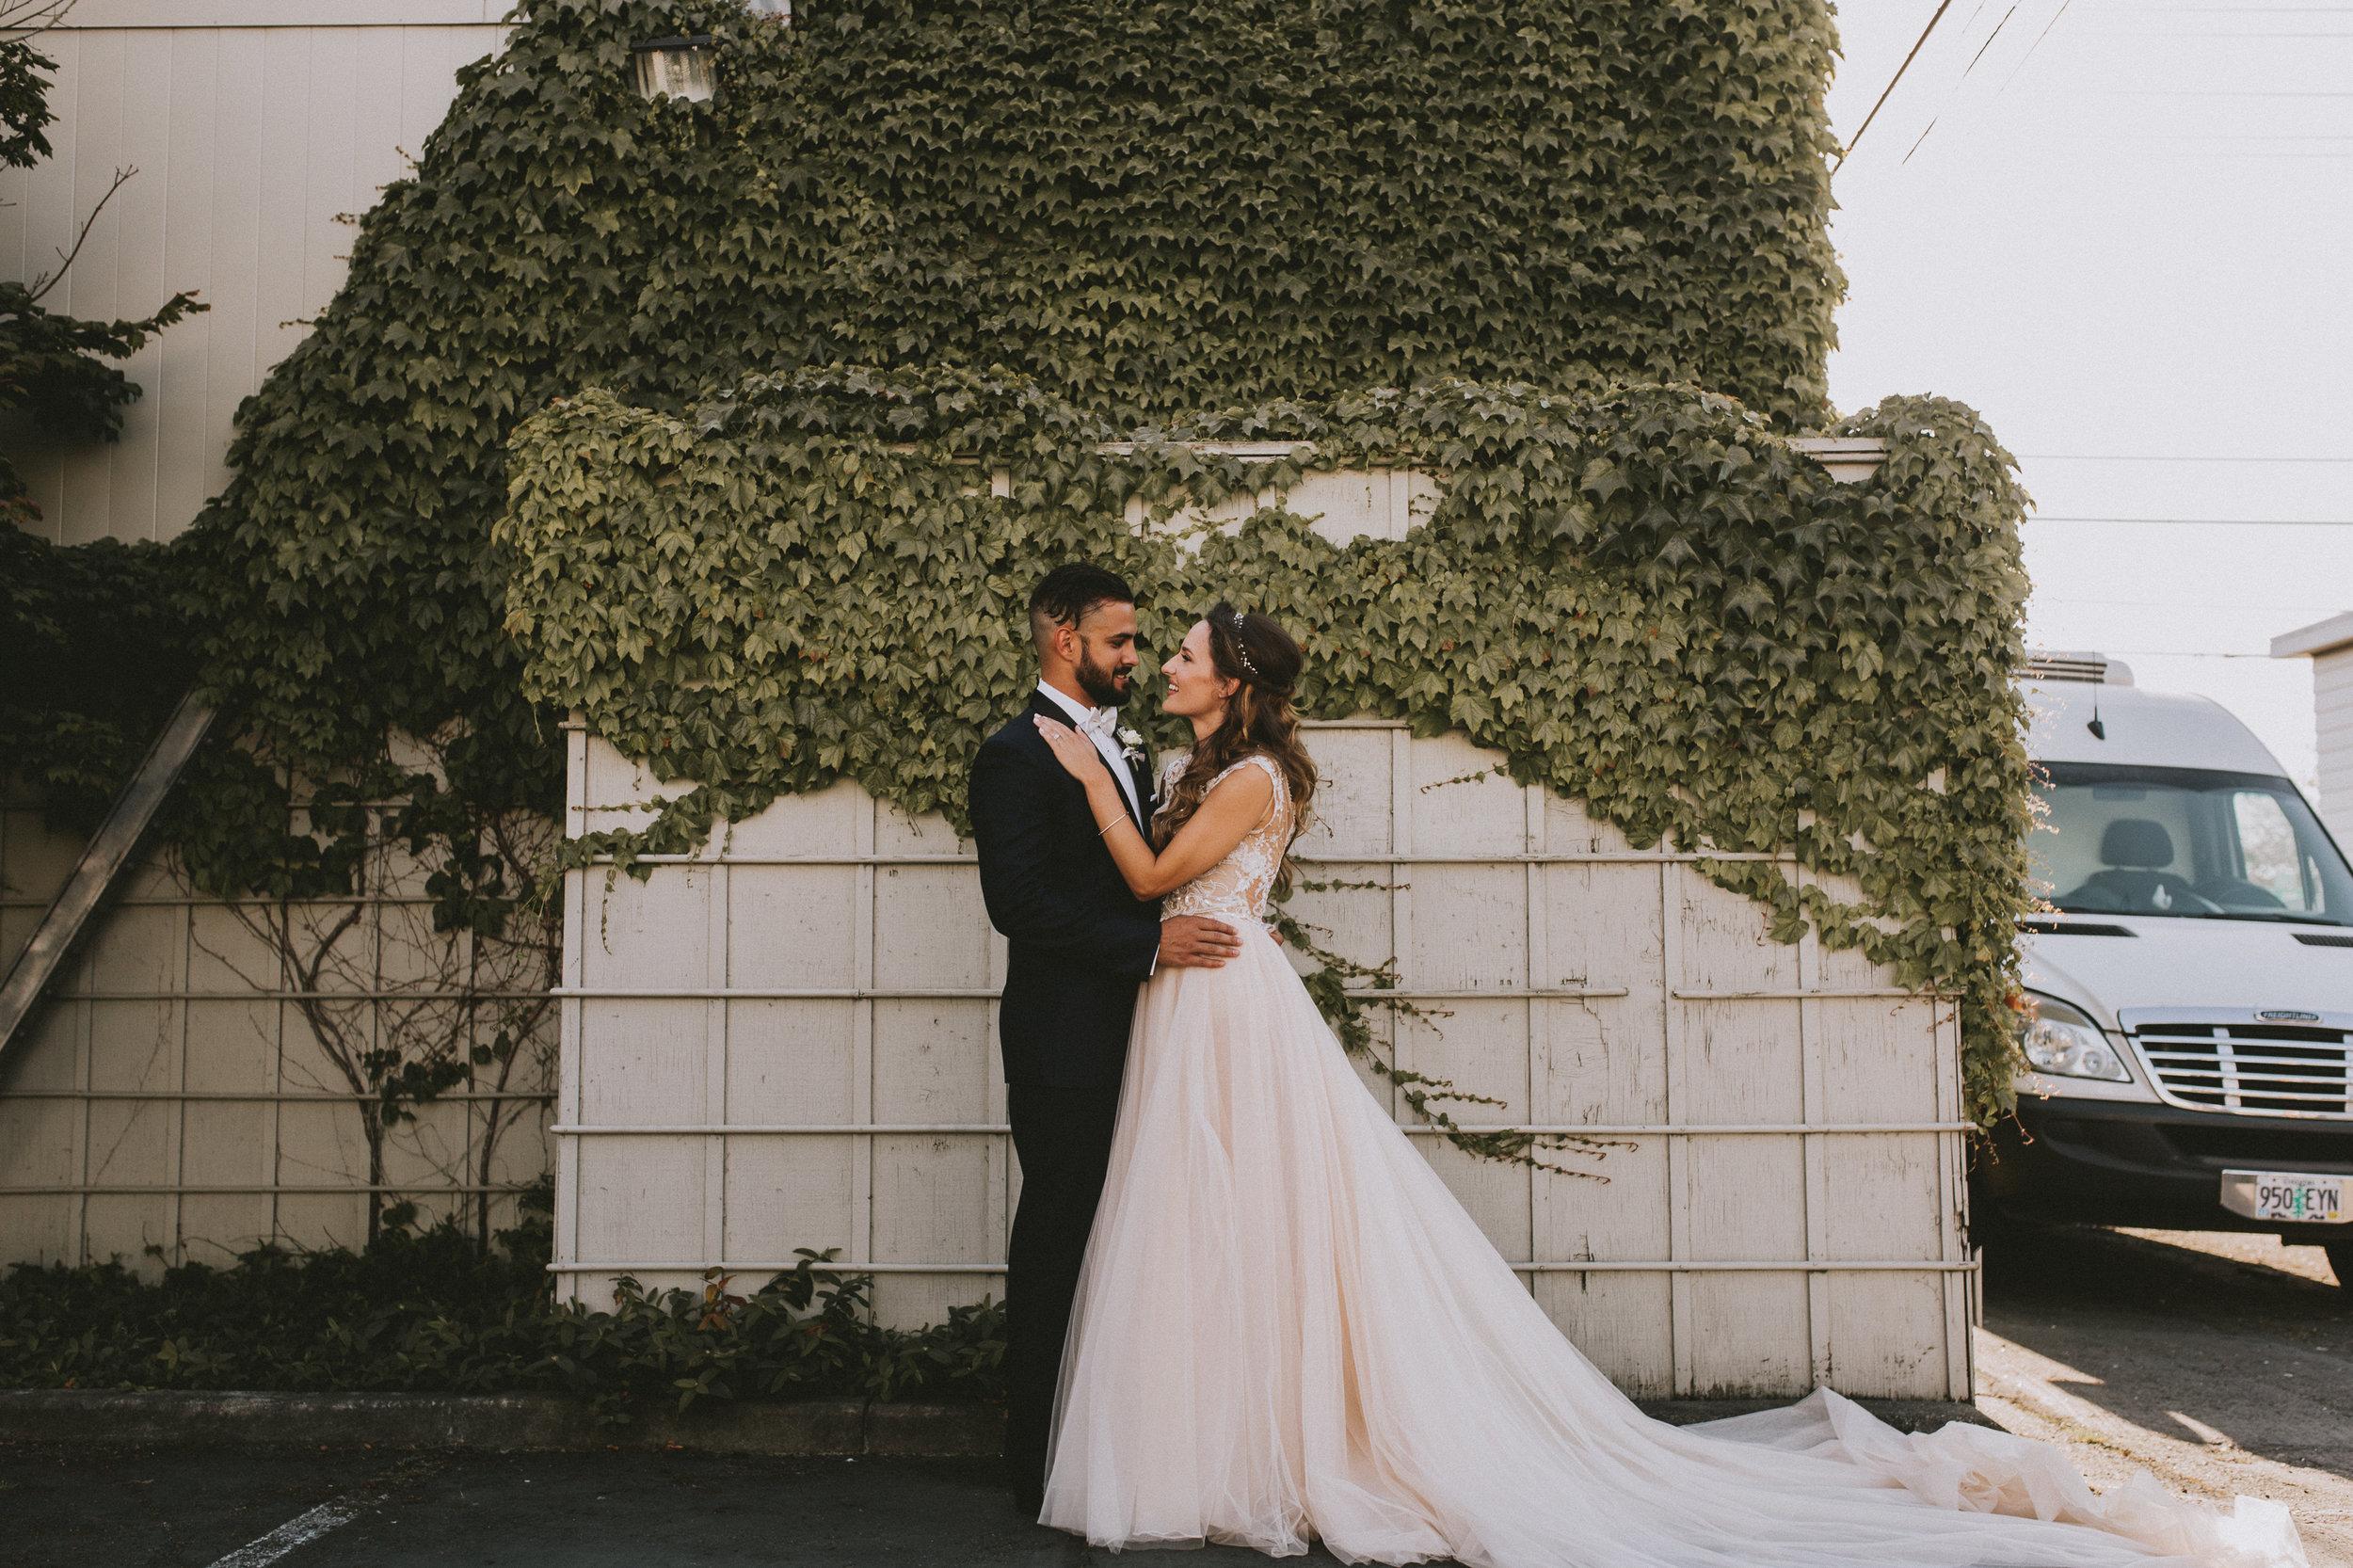 SAMLANDRETH-bridals-9.jpg